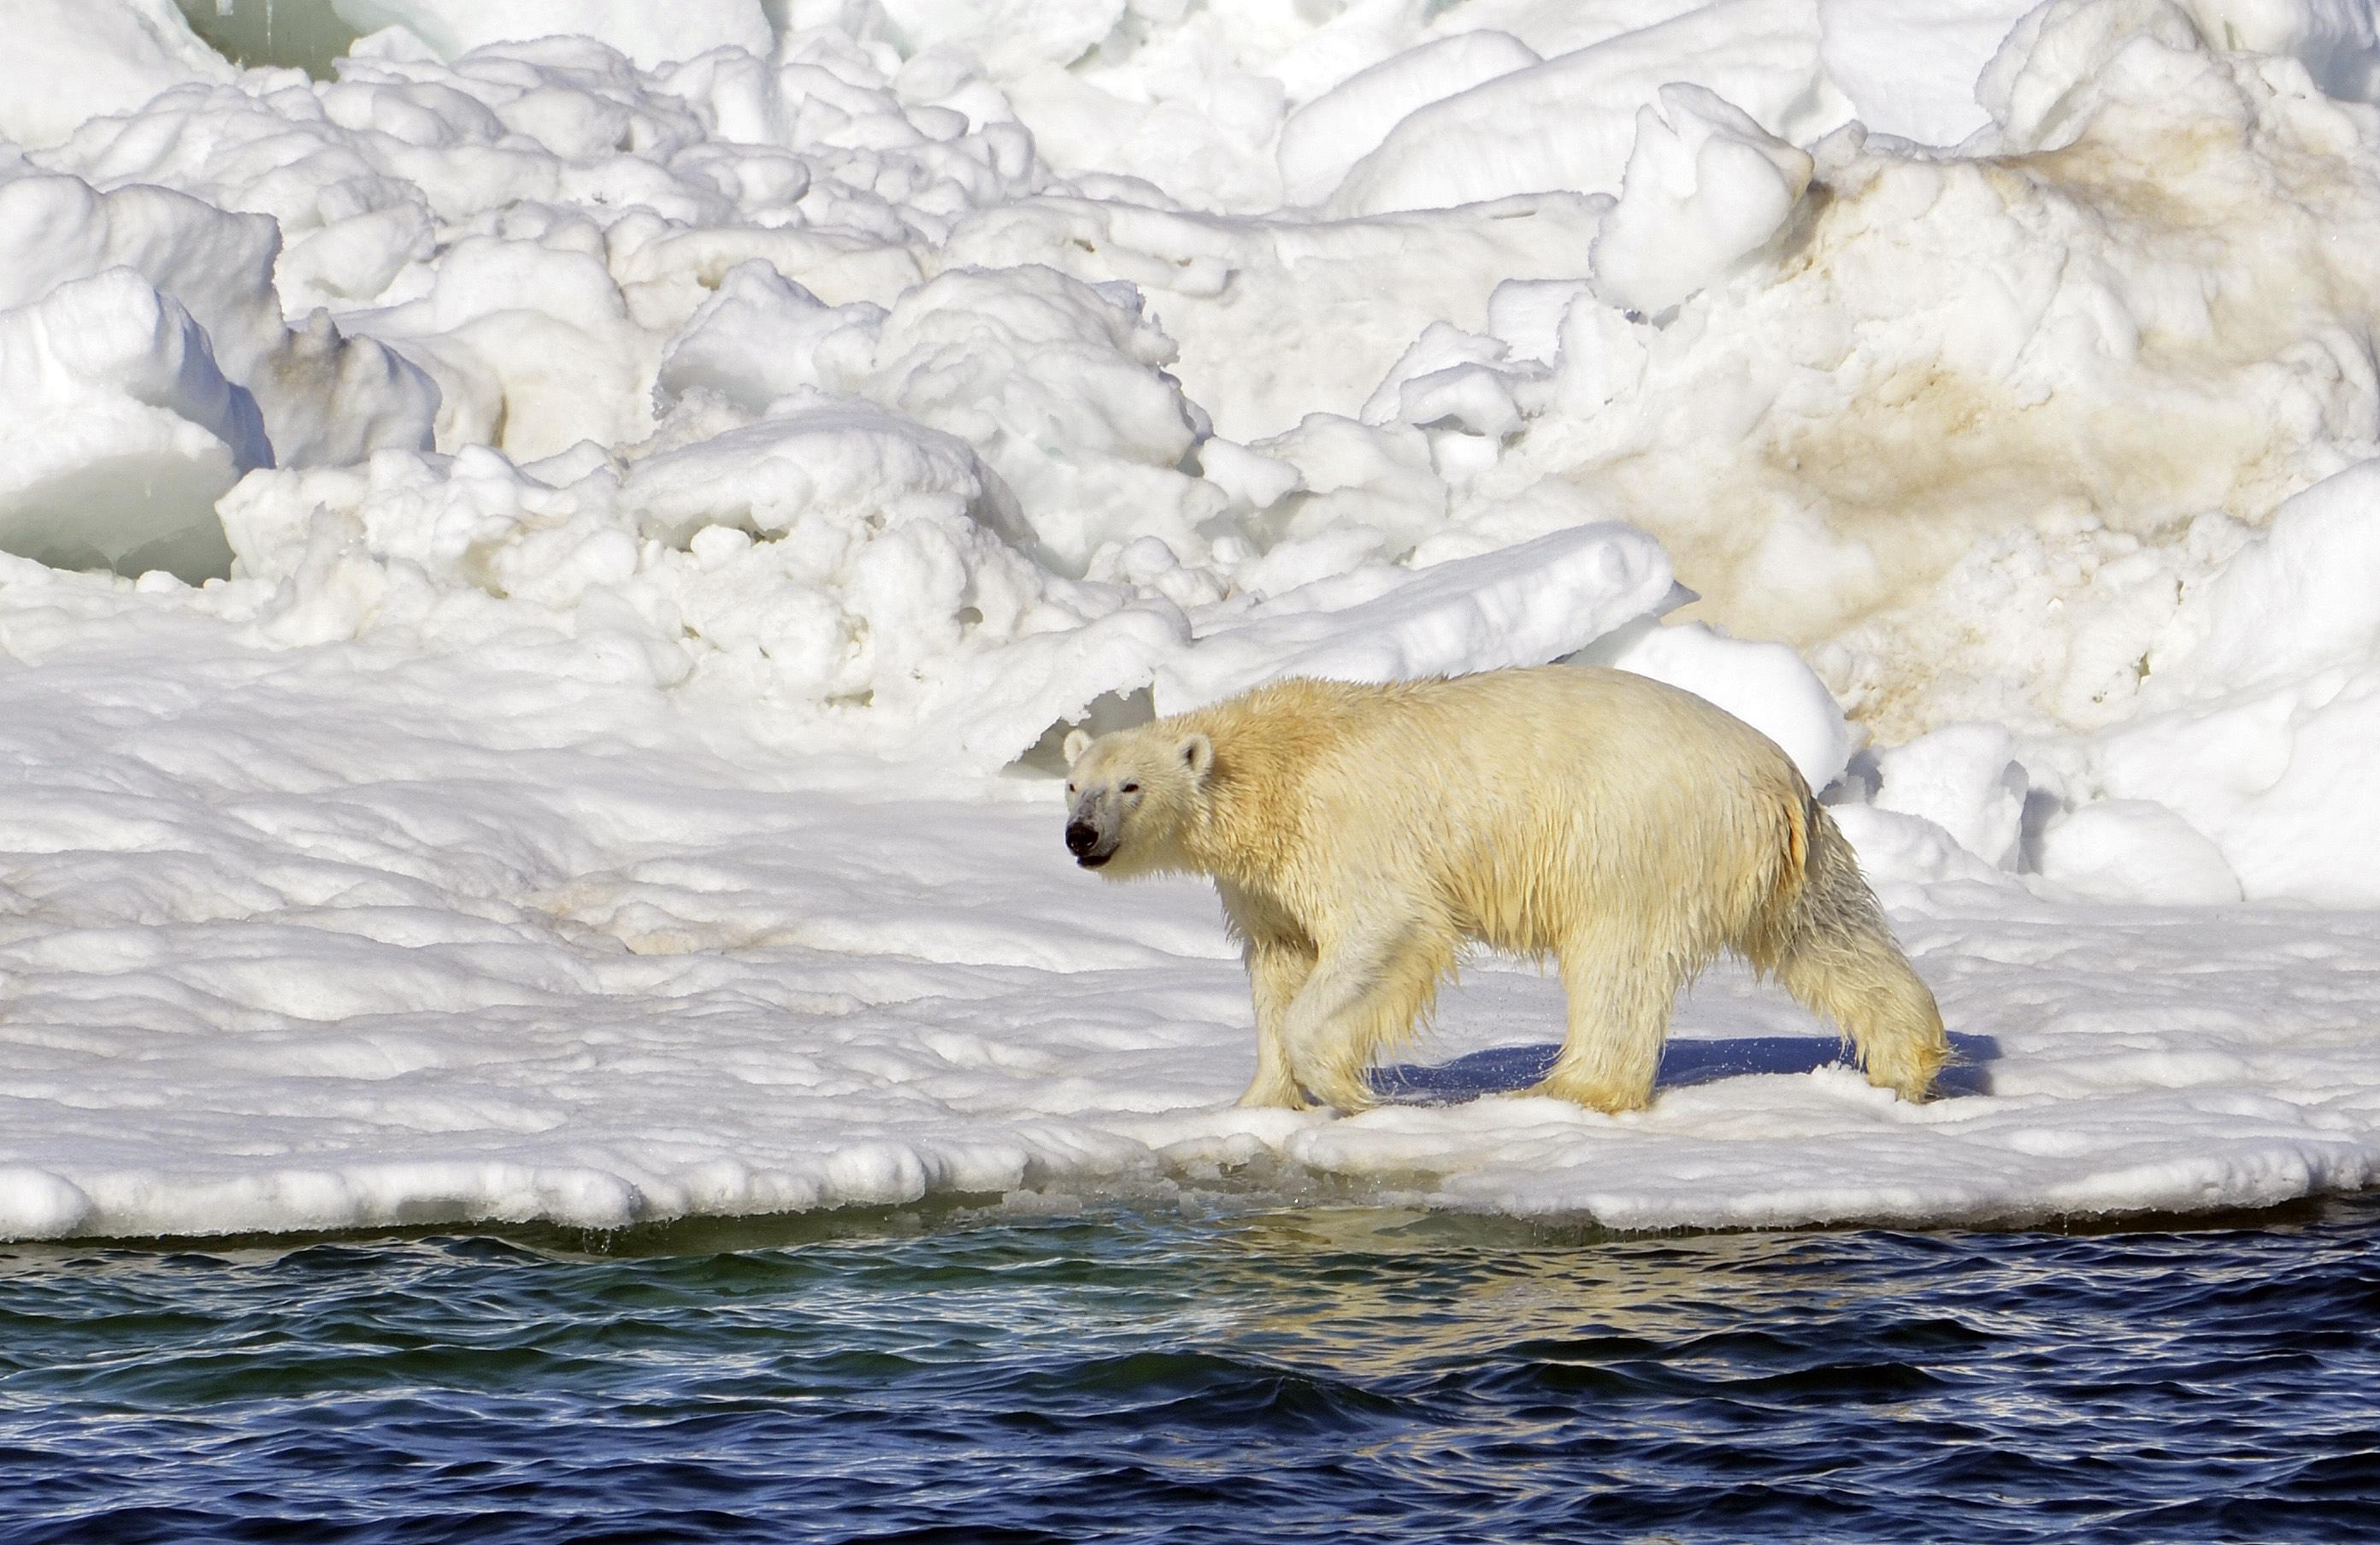 A polar bear walks along the edge of Arctic Ocean sea ice in Alaska's Chukchi Sea in 2014. (Brian Battaile / USGS)